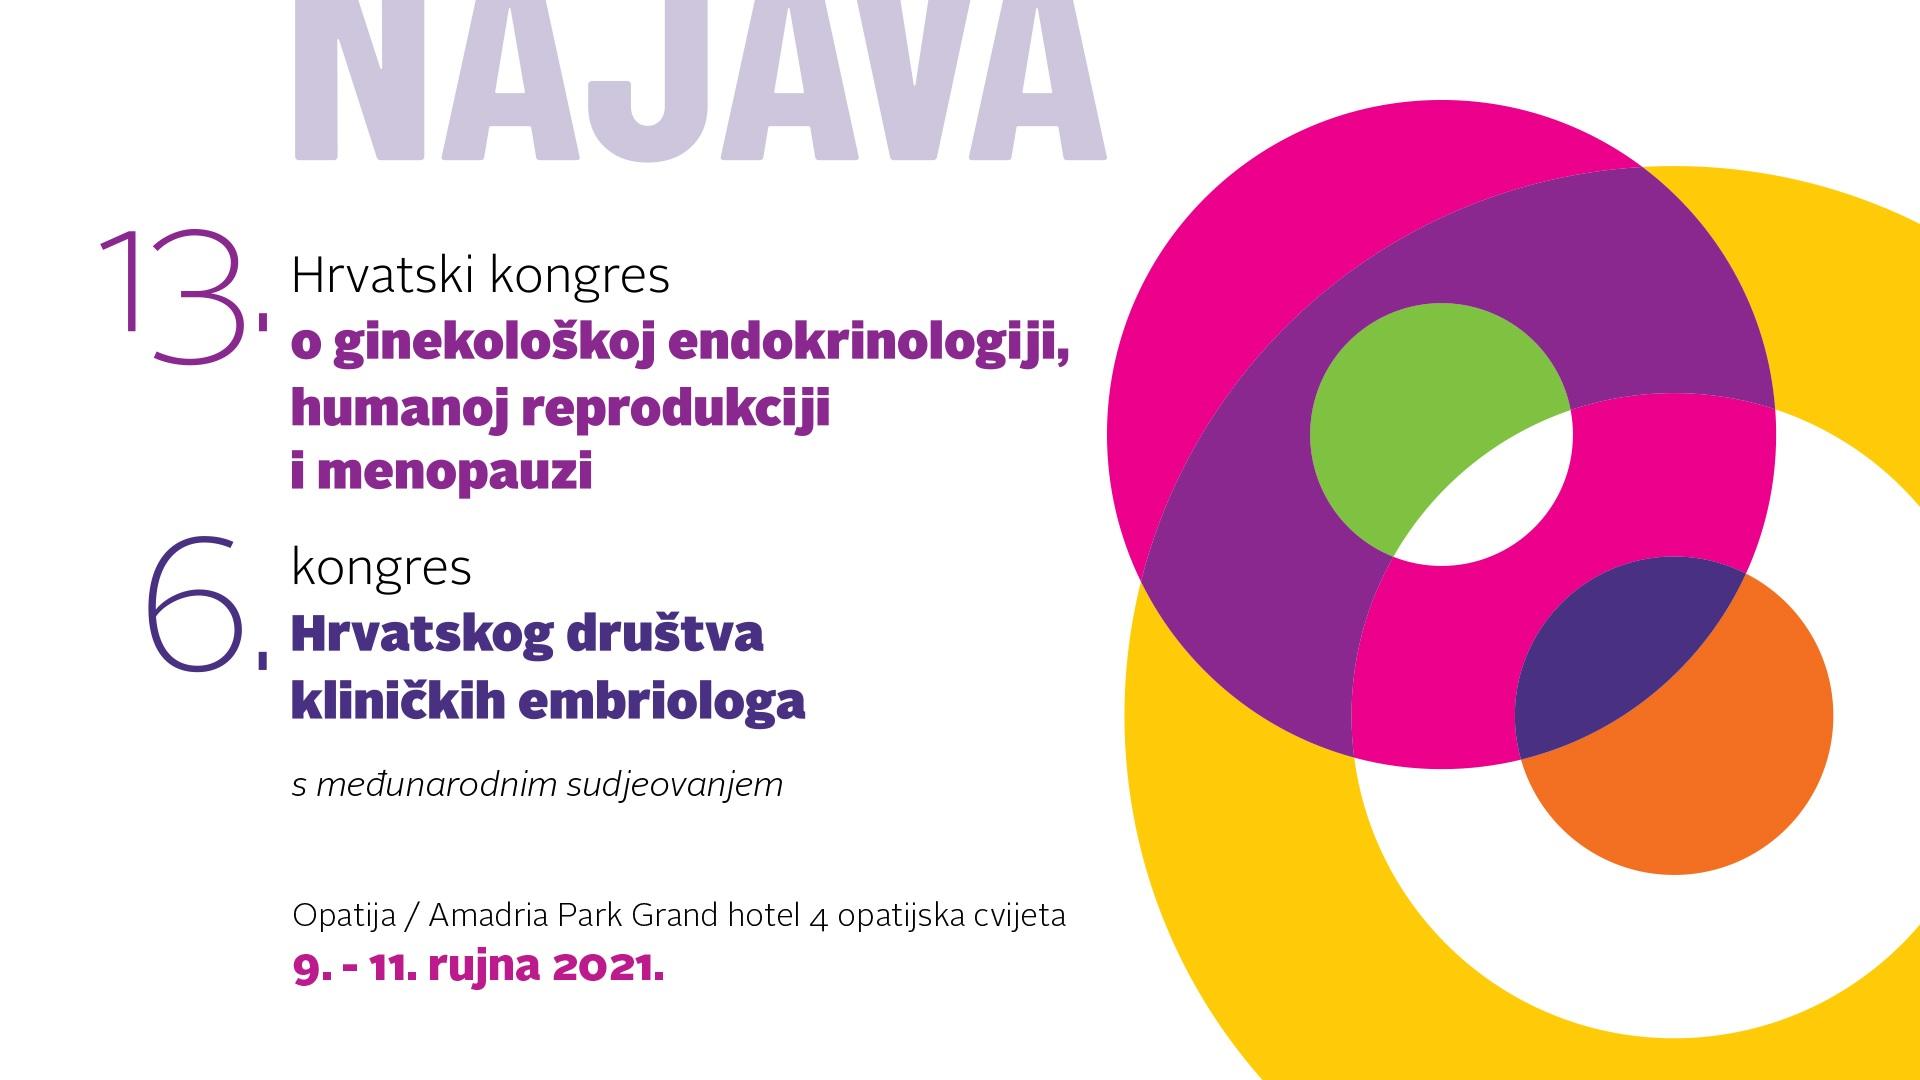 Kongresi Reprodukcija i embriologija